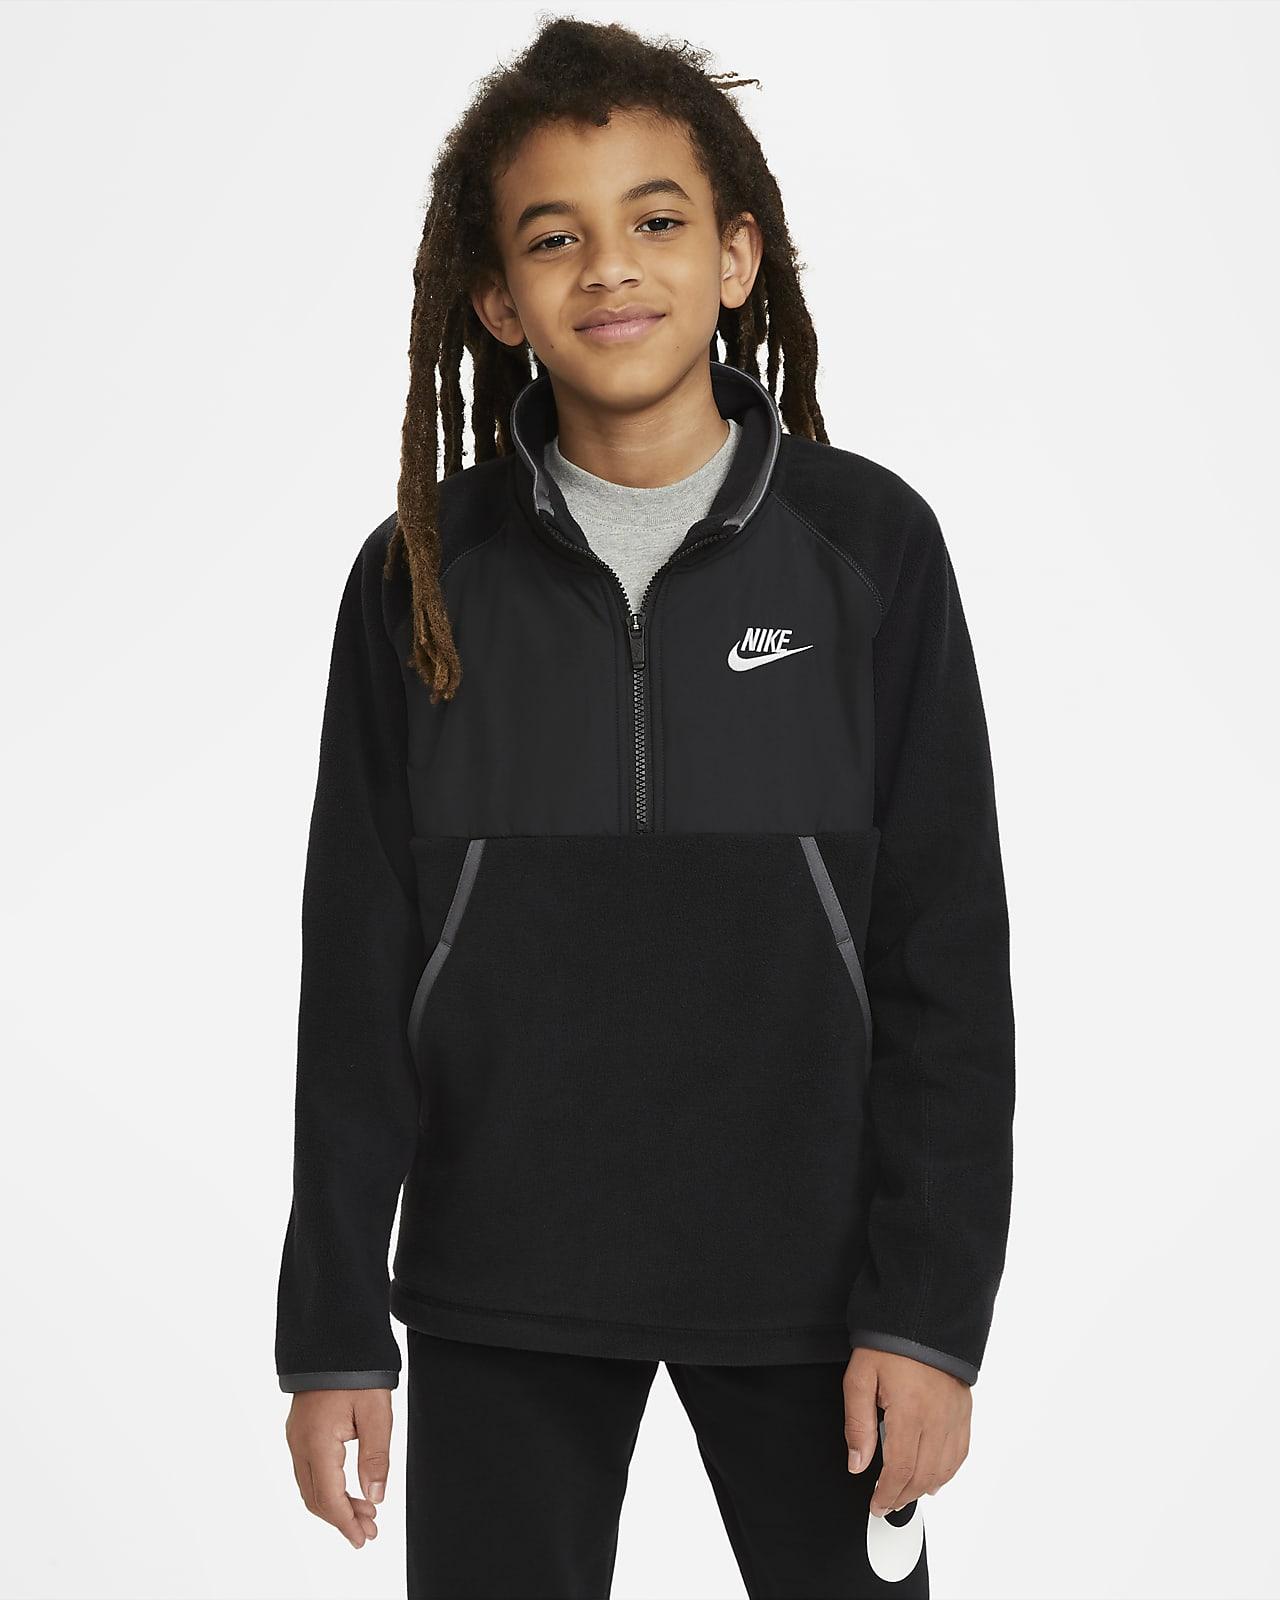 Nike Sportswear Camiseta de invierno con media cremallera - Niño